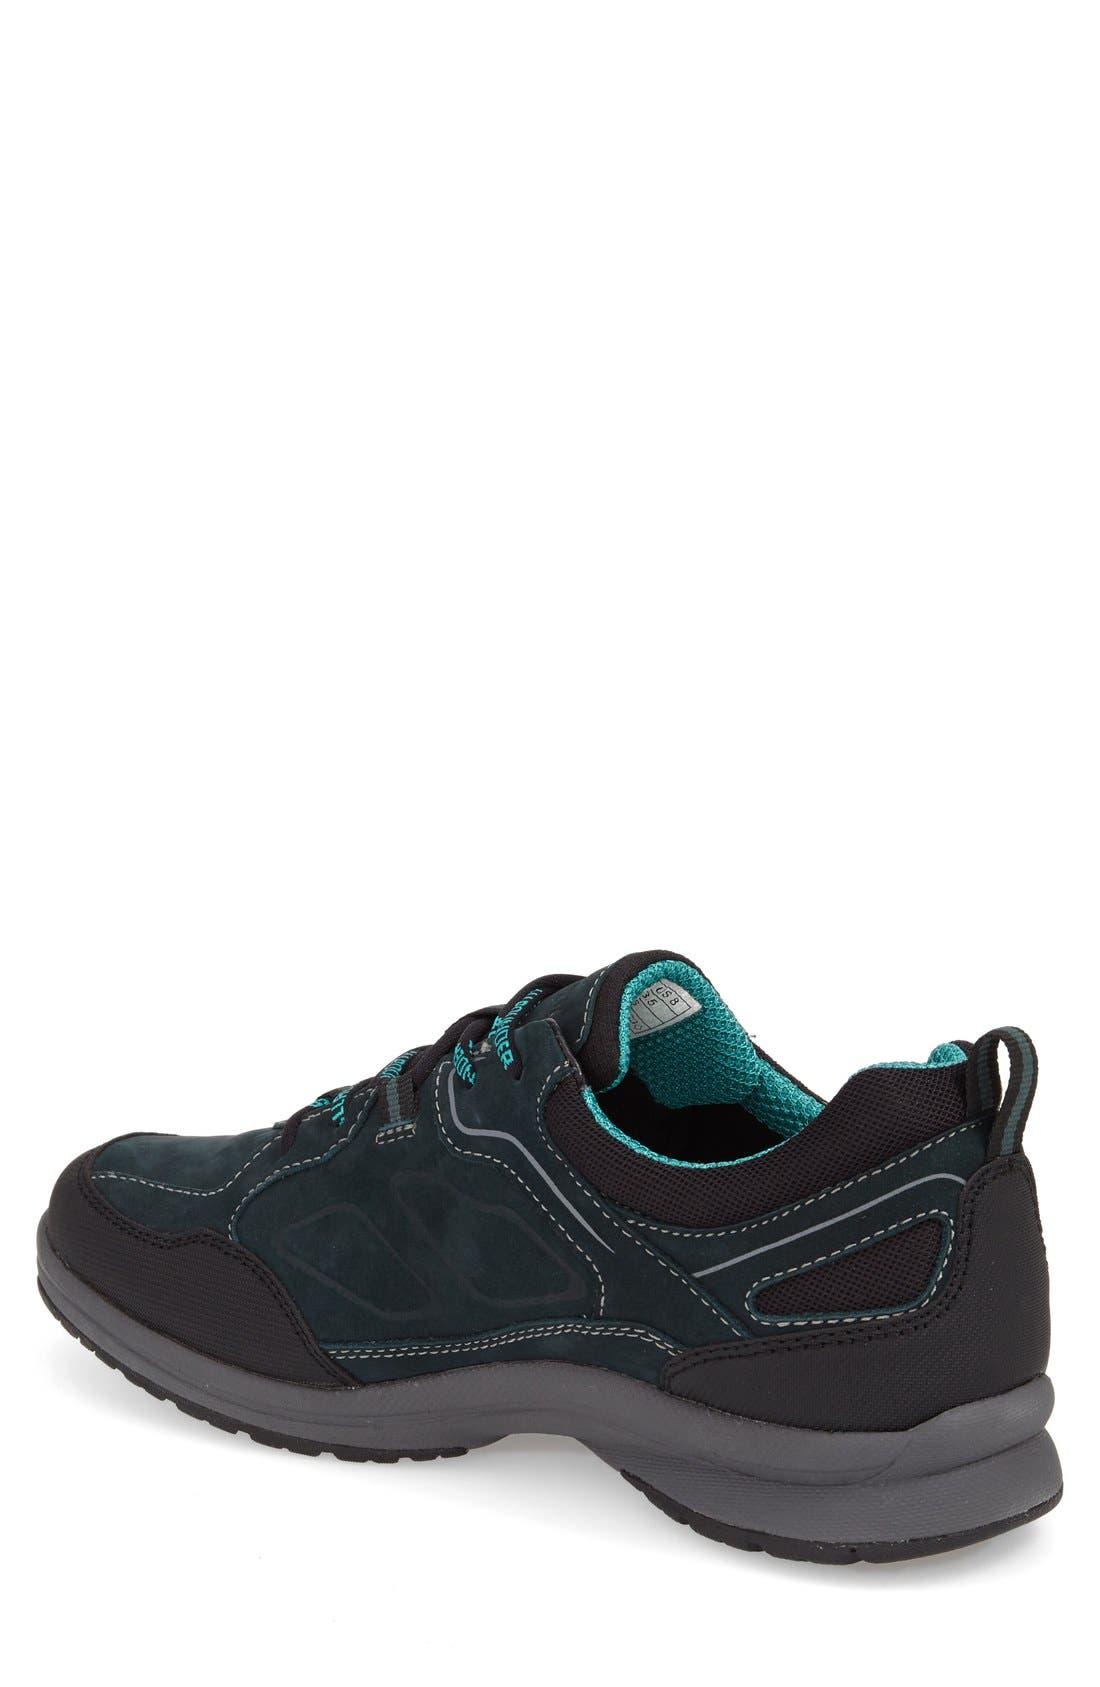 Alternate Image 2  - Allrounder by Mephisto 'Dascha Tex' Waterproof Sneaker (Women)